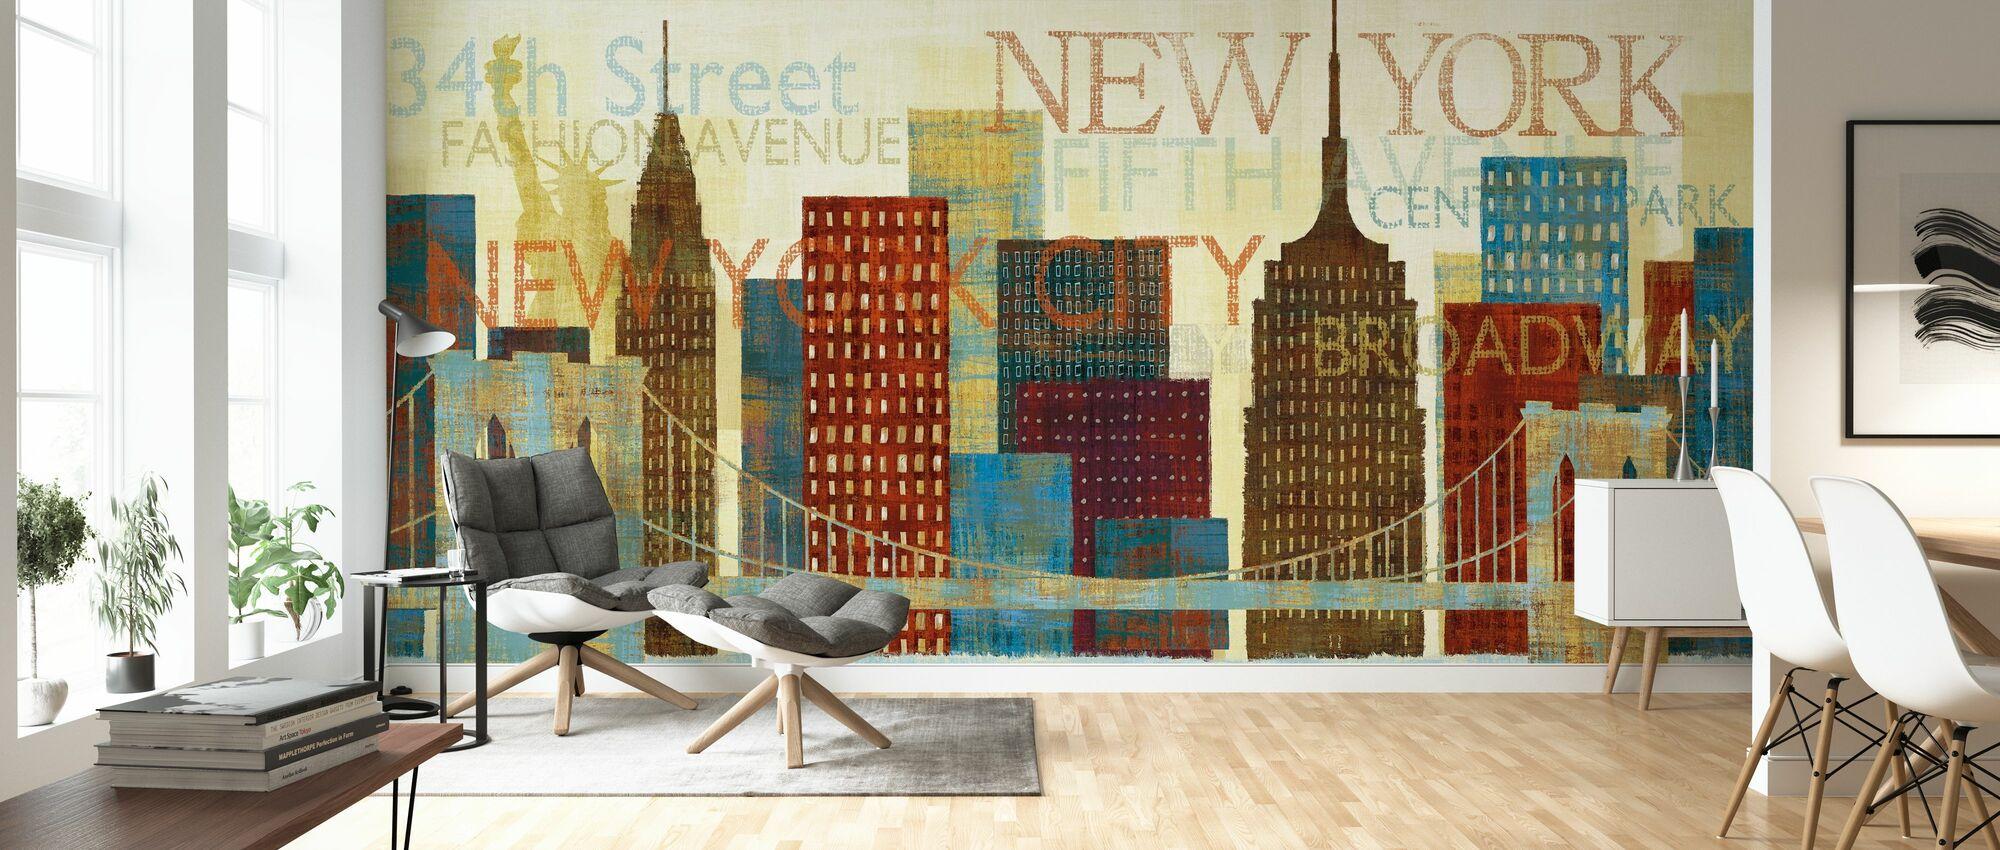 Hey New York - Wallpaper - Living Room